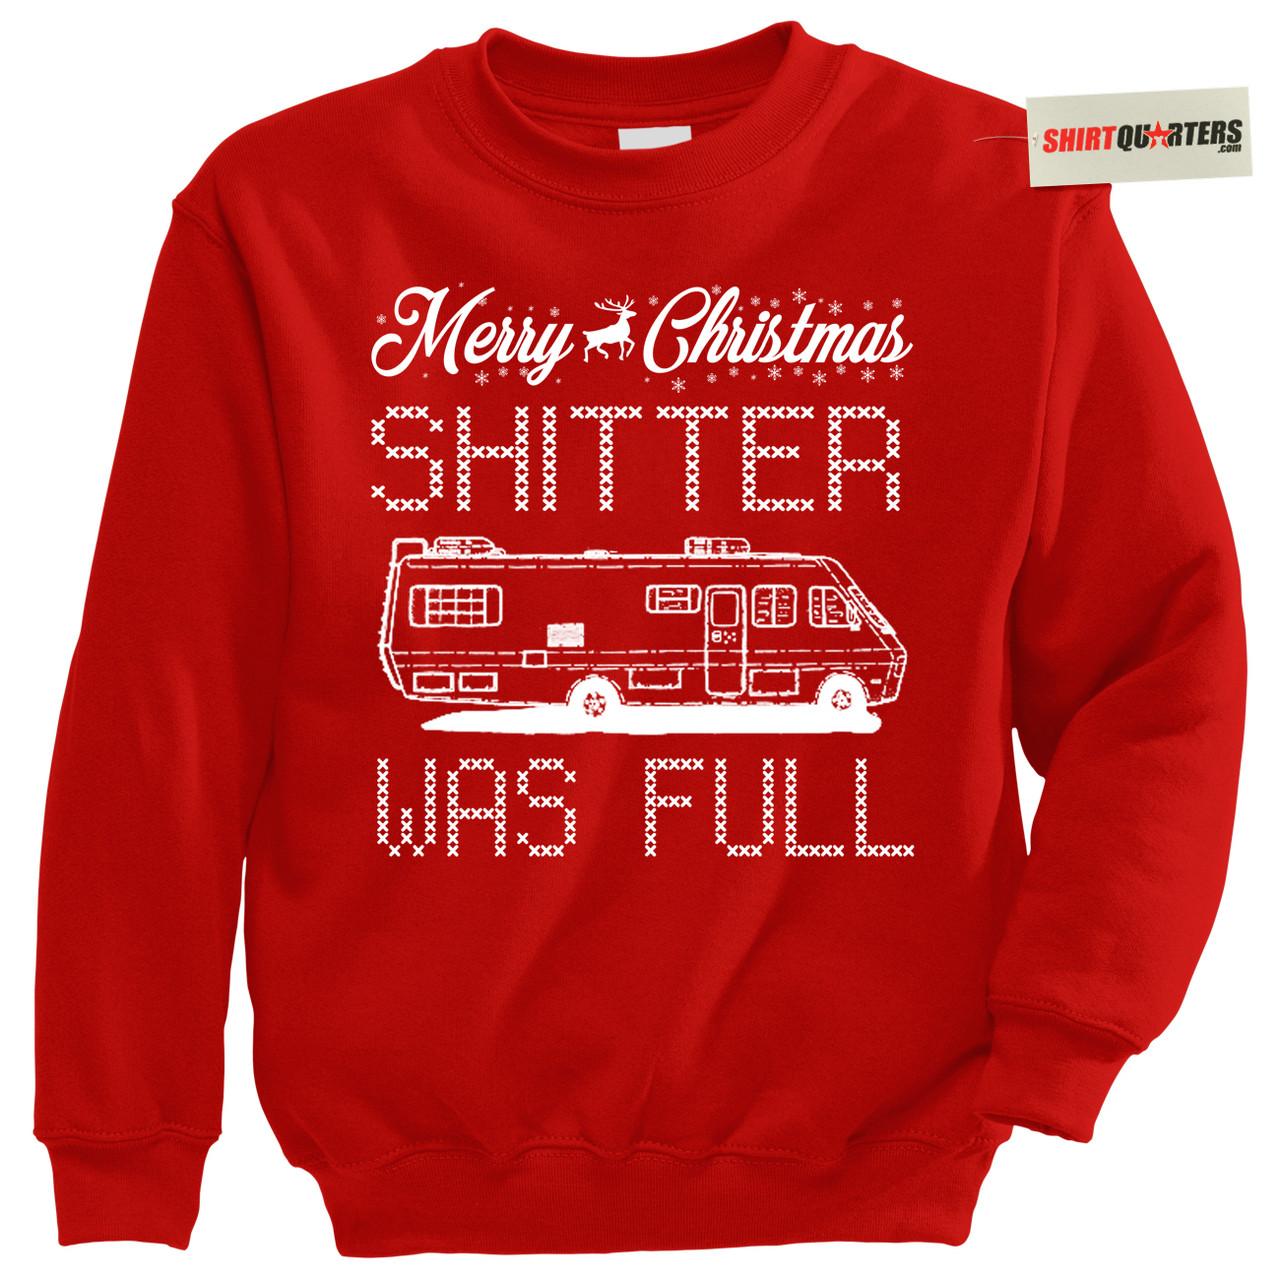 e997bed59d9 Merry Christmas Shitter Was Full Sweatshirt - Shirtquarters